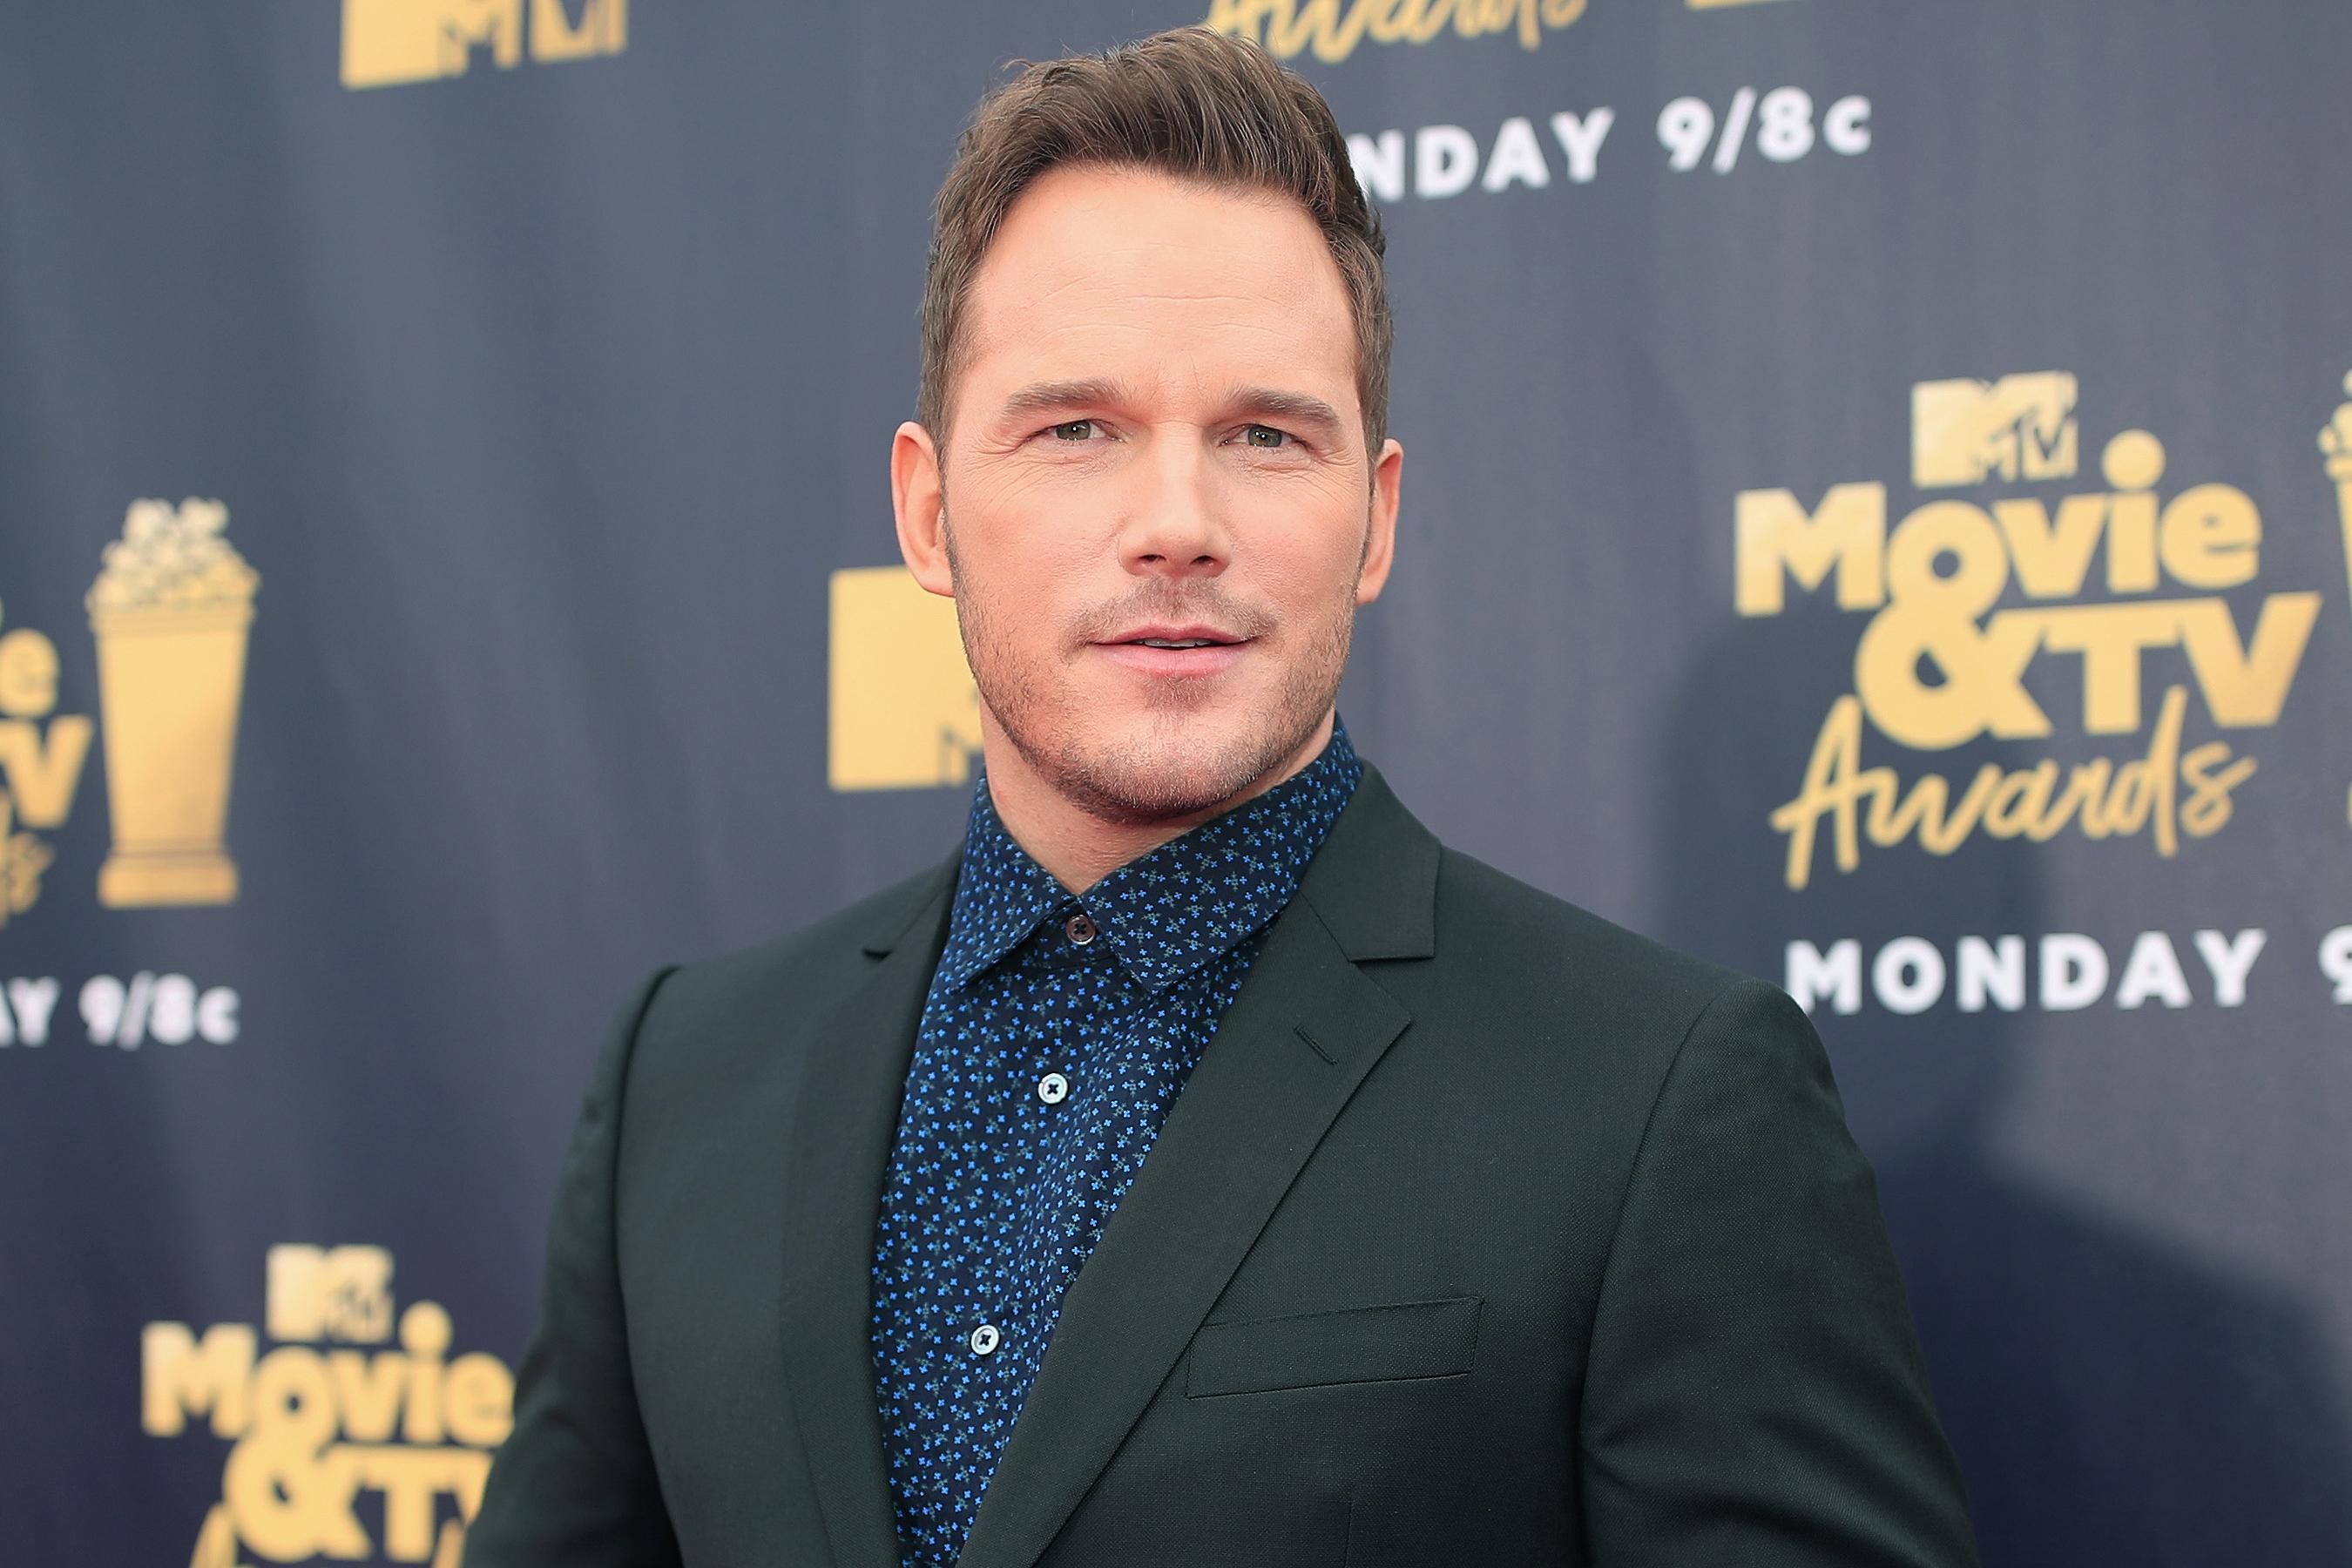 Chris Pratt Urges Fans to Help Him Reach 28 Million Instagram Followers